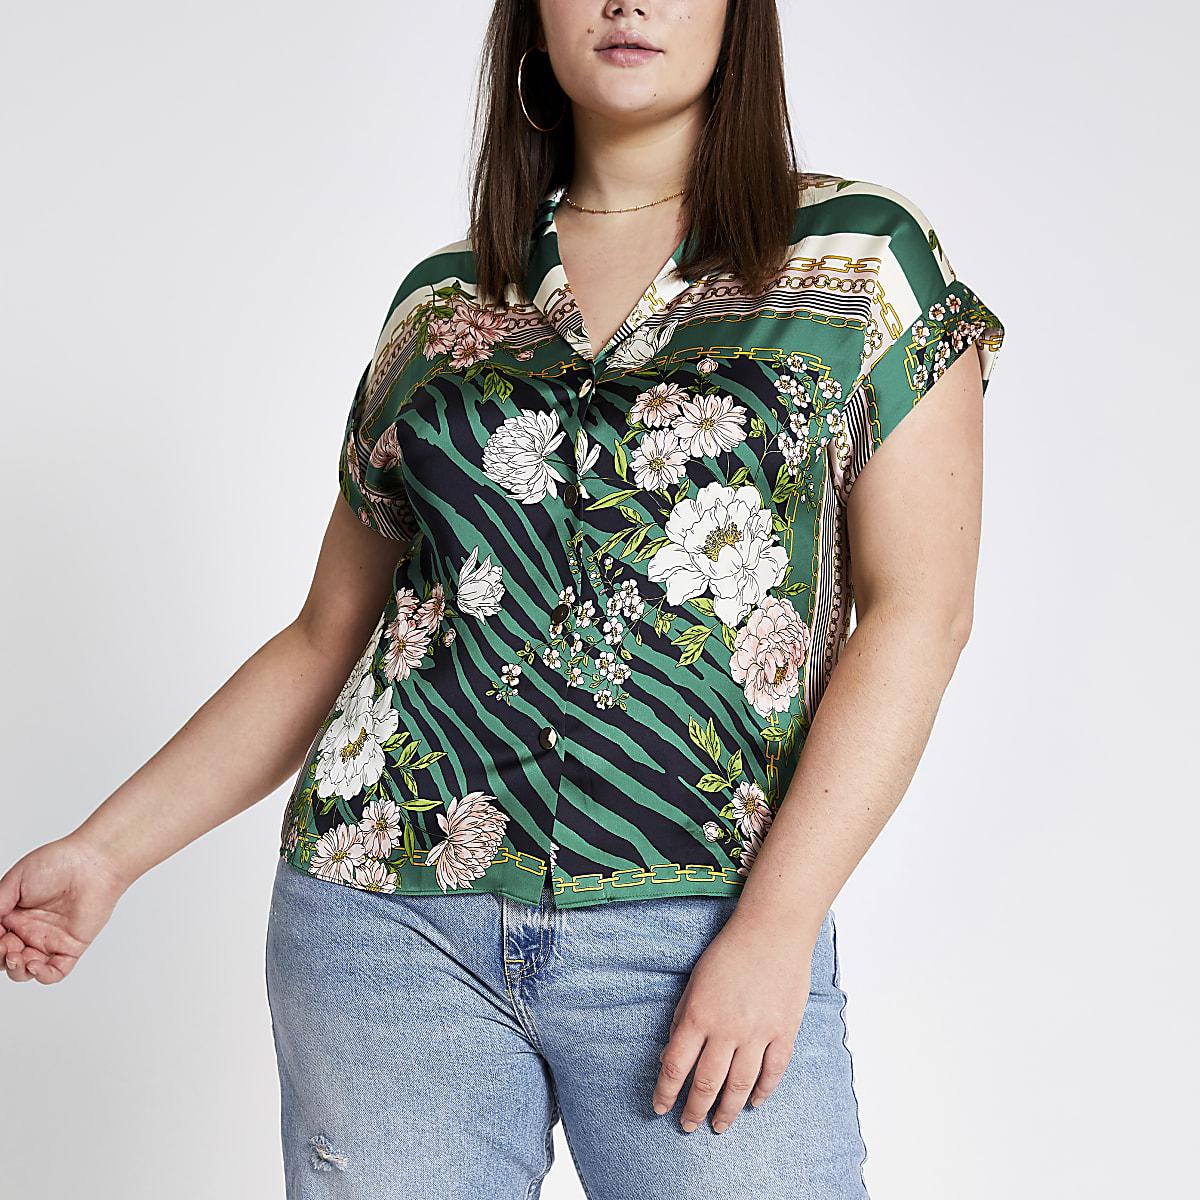 RI Plus - Groen overhemd met print en korte mouwen